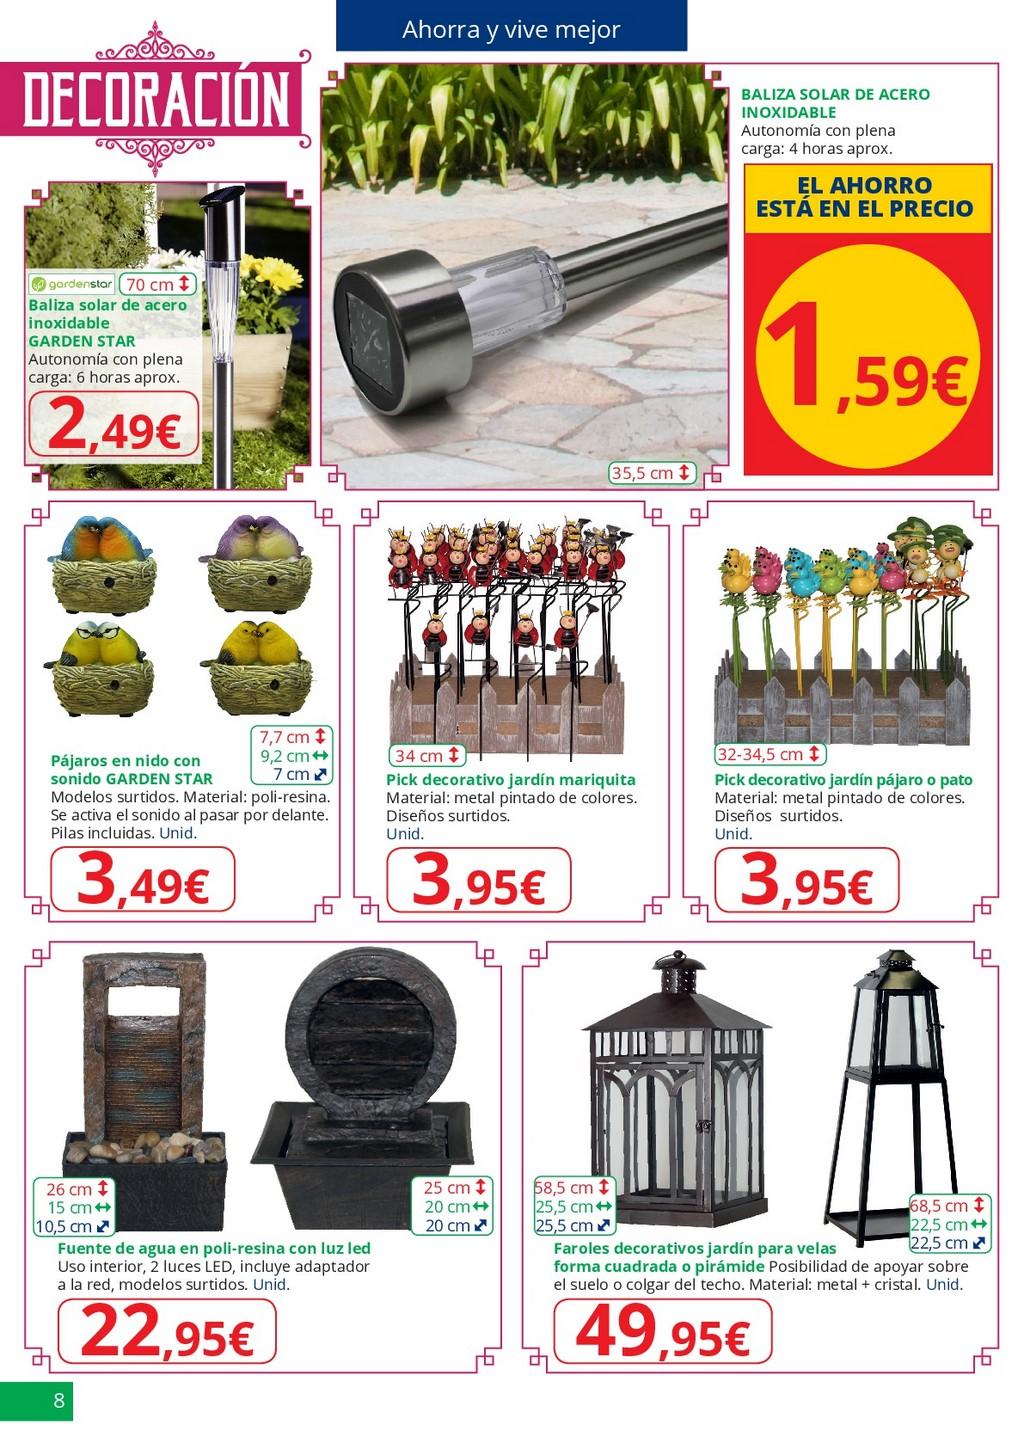 Especial jardin8 for Jardin alcampo 2016